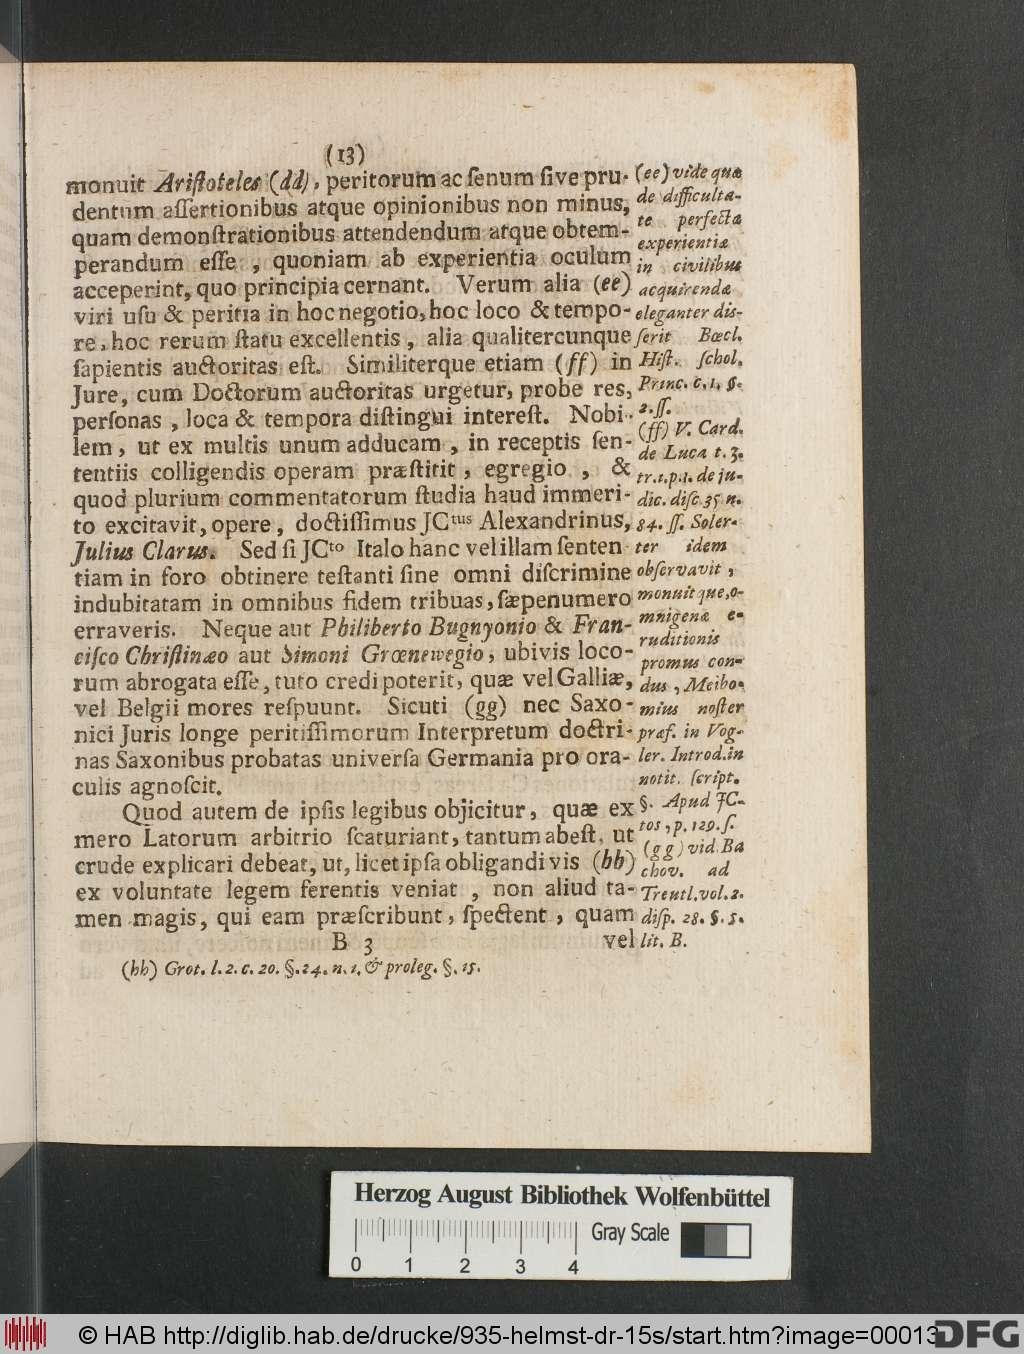 https://diglib.hab.de/drucke/935-helmst-dr-15s/00013.jpg